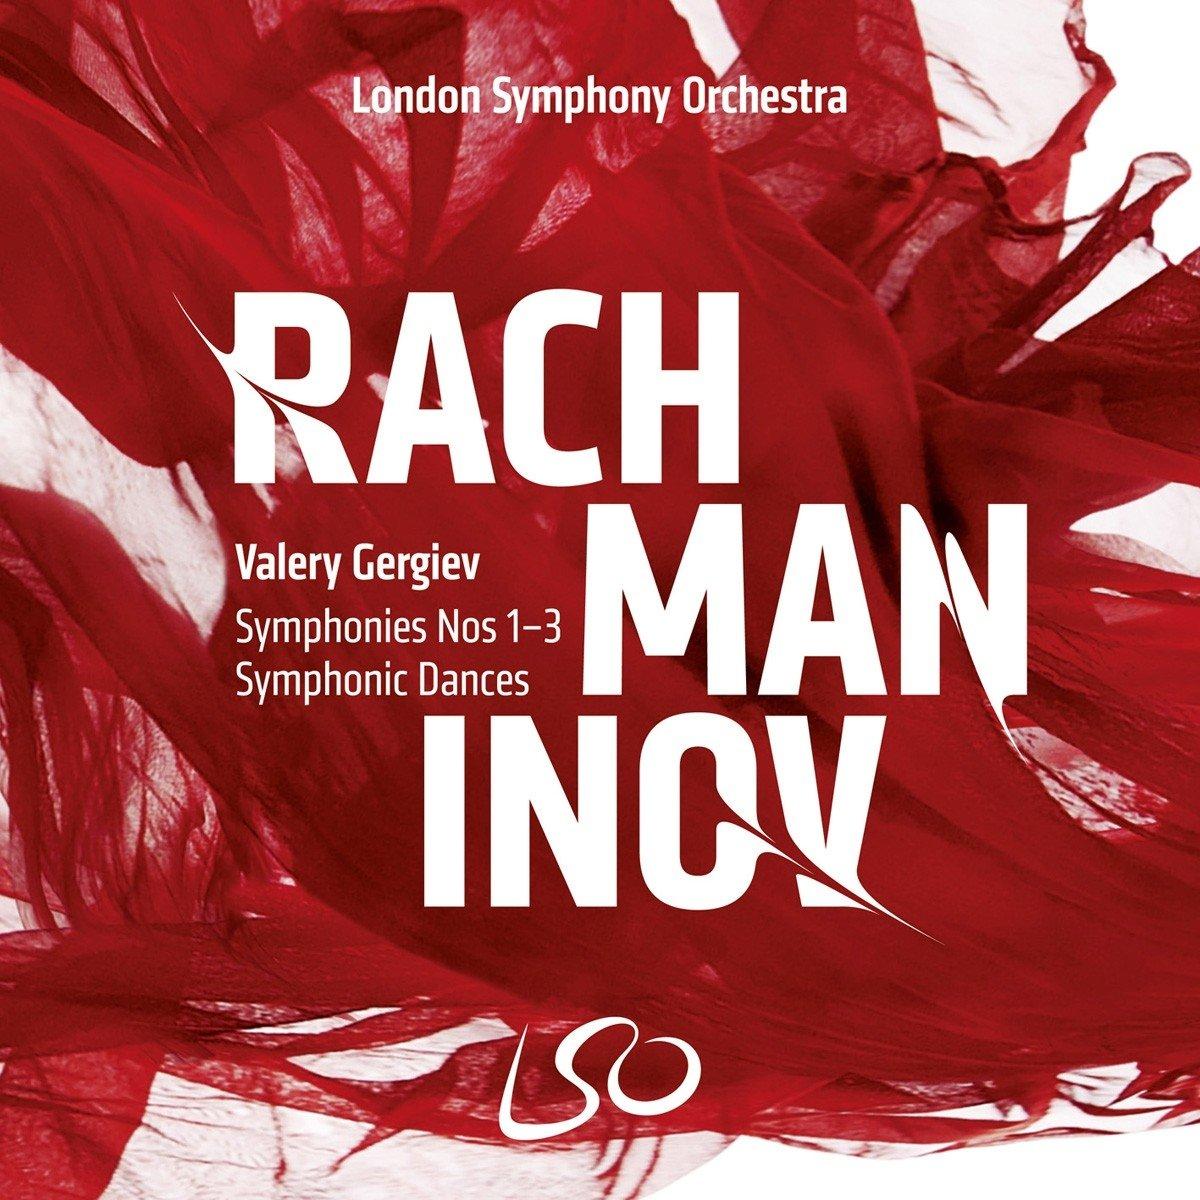 Rachmaninov: Symphonies Nos.1-3, Symphonic Dances